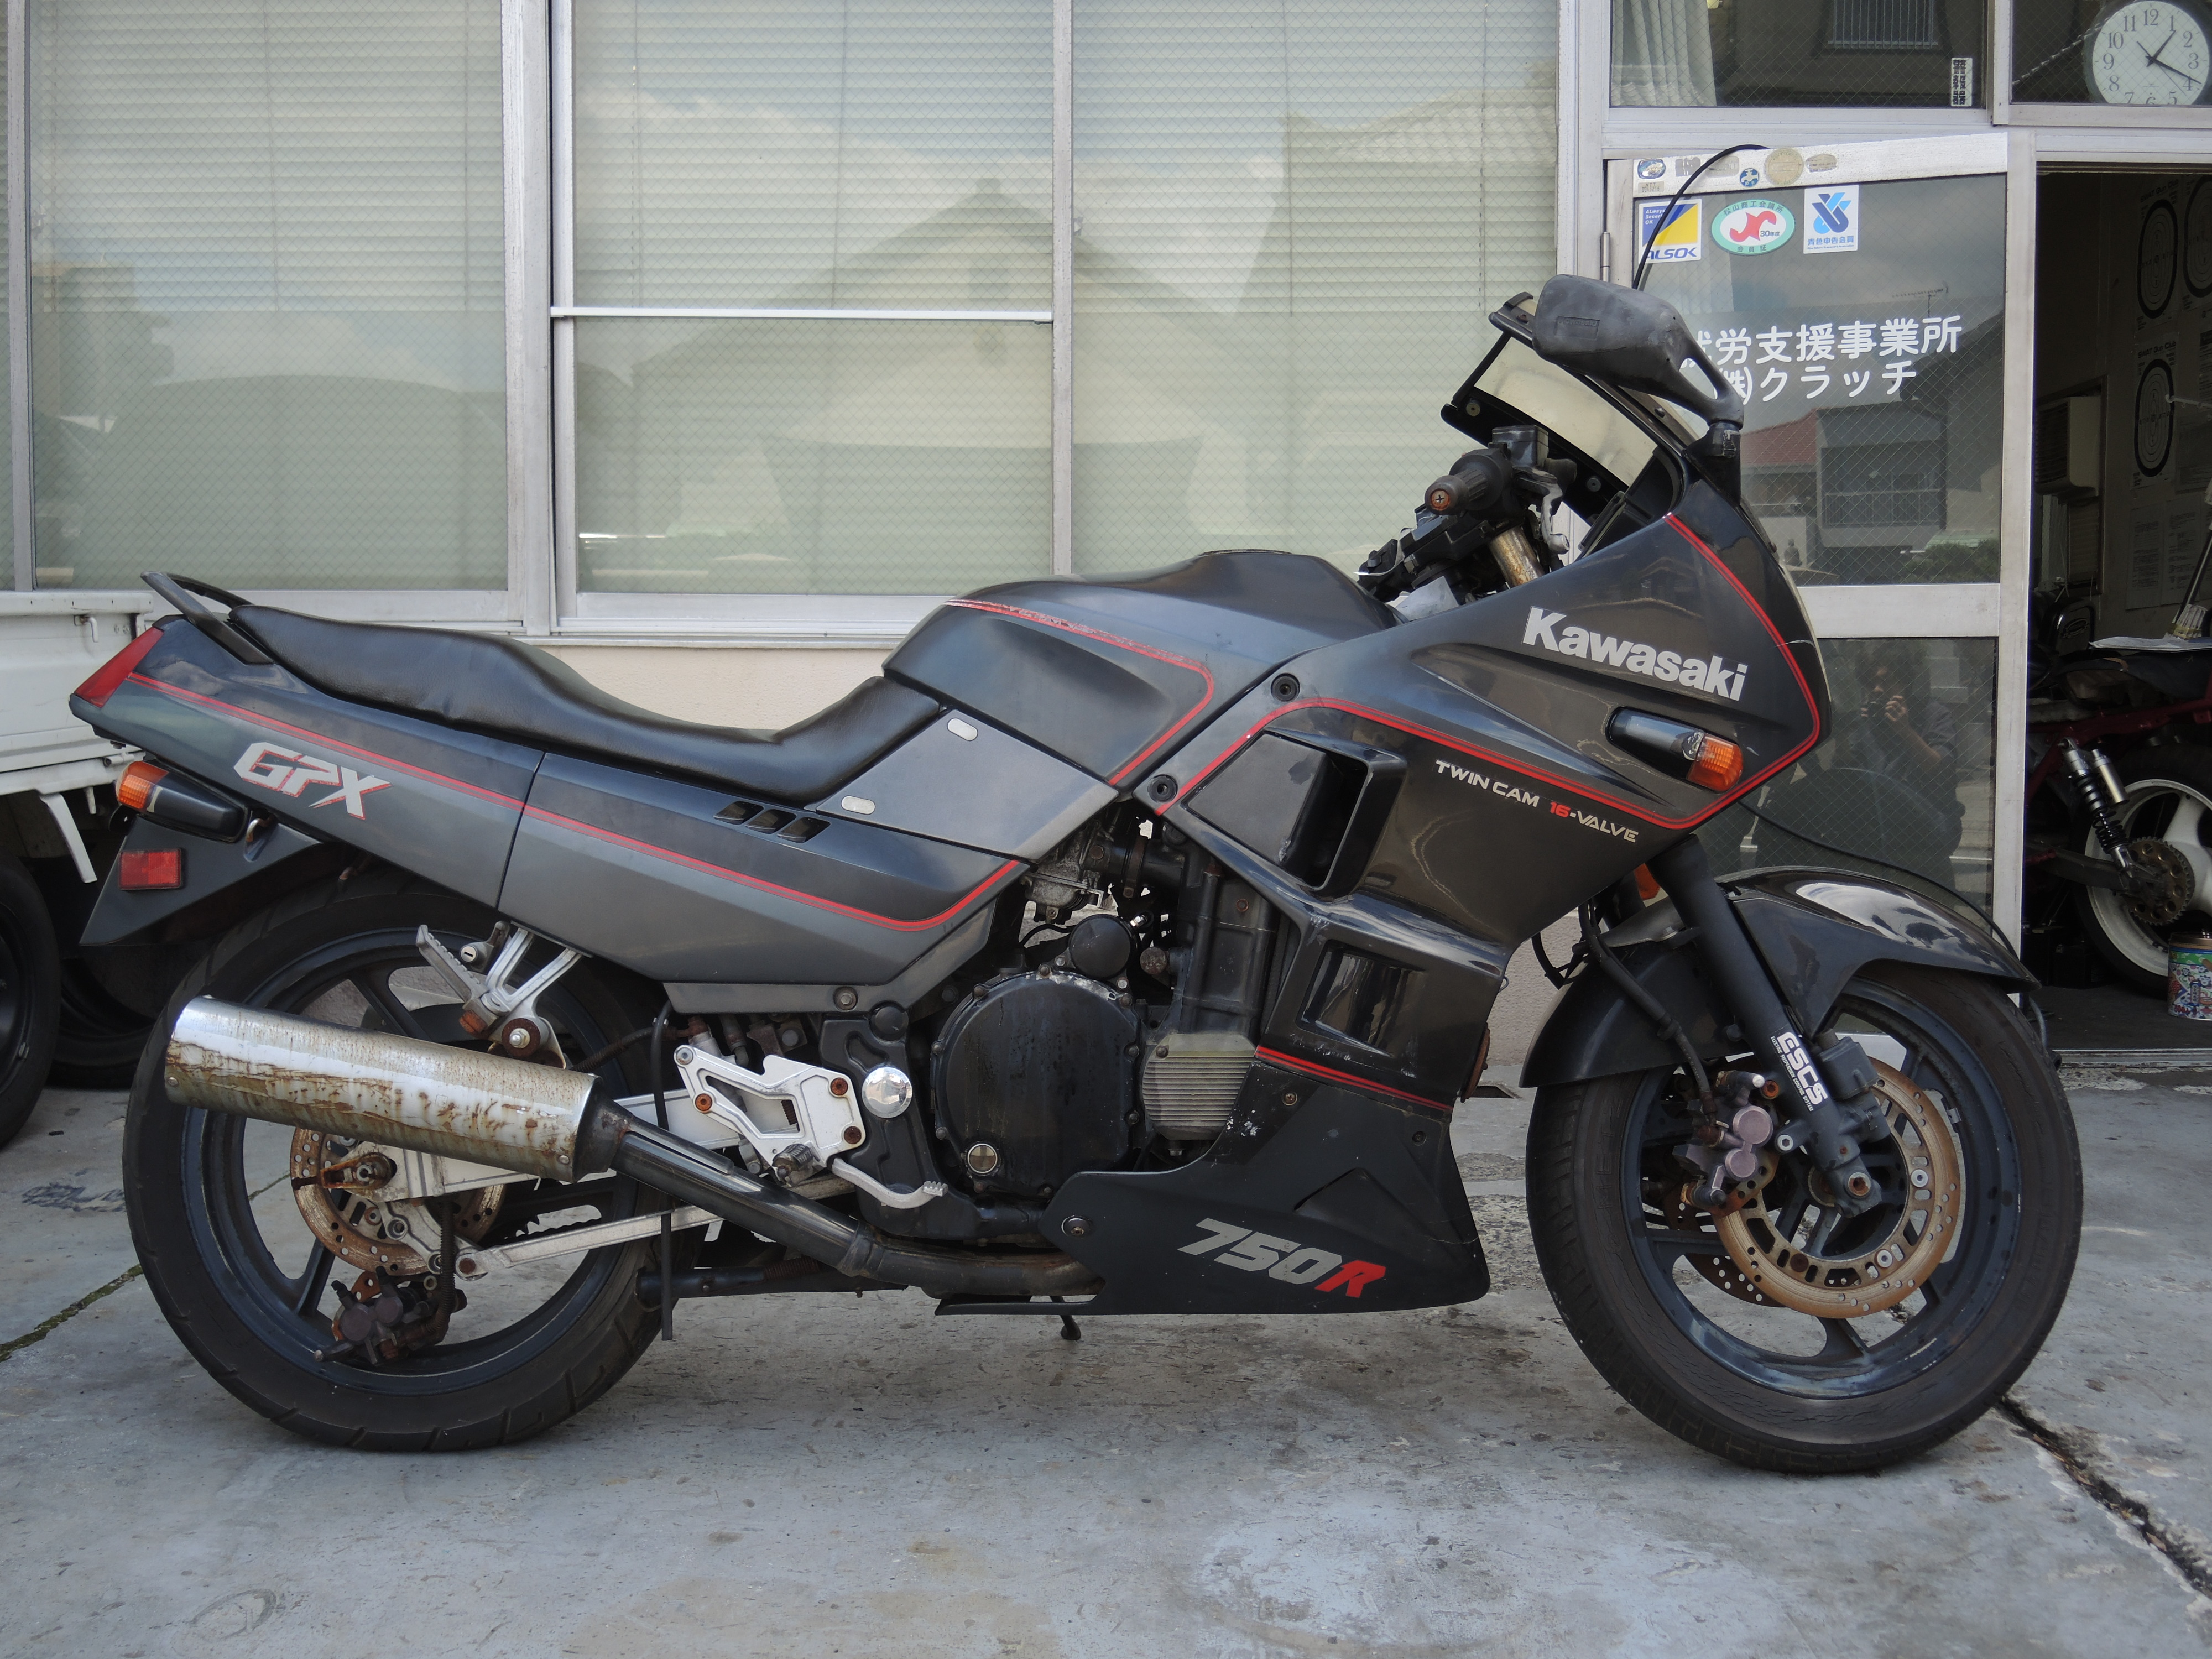 GPX750R